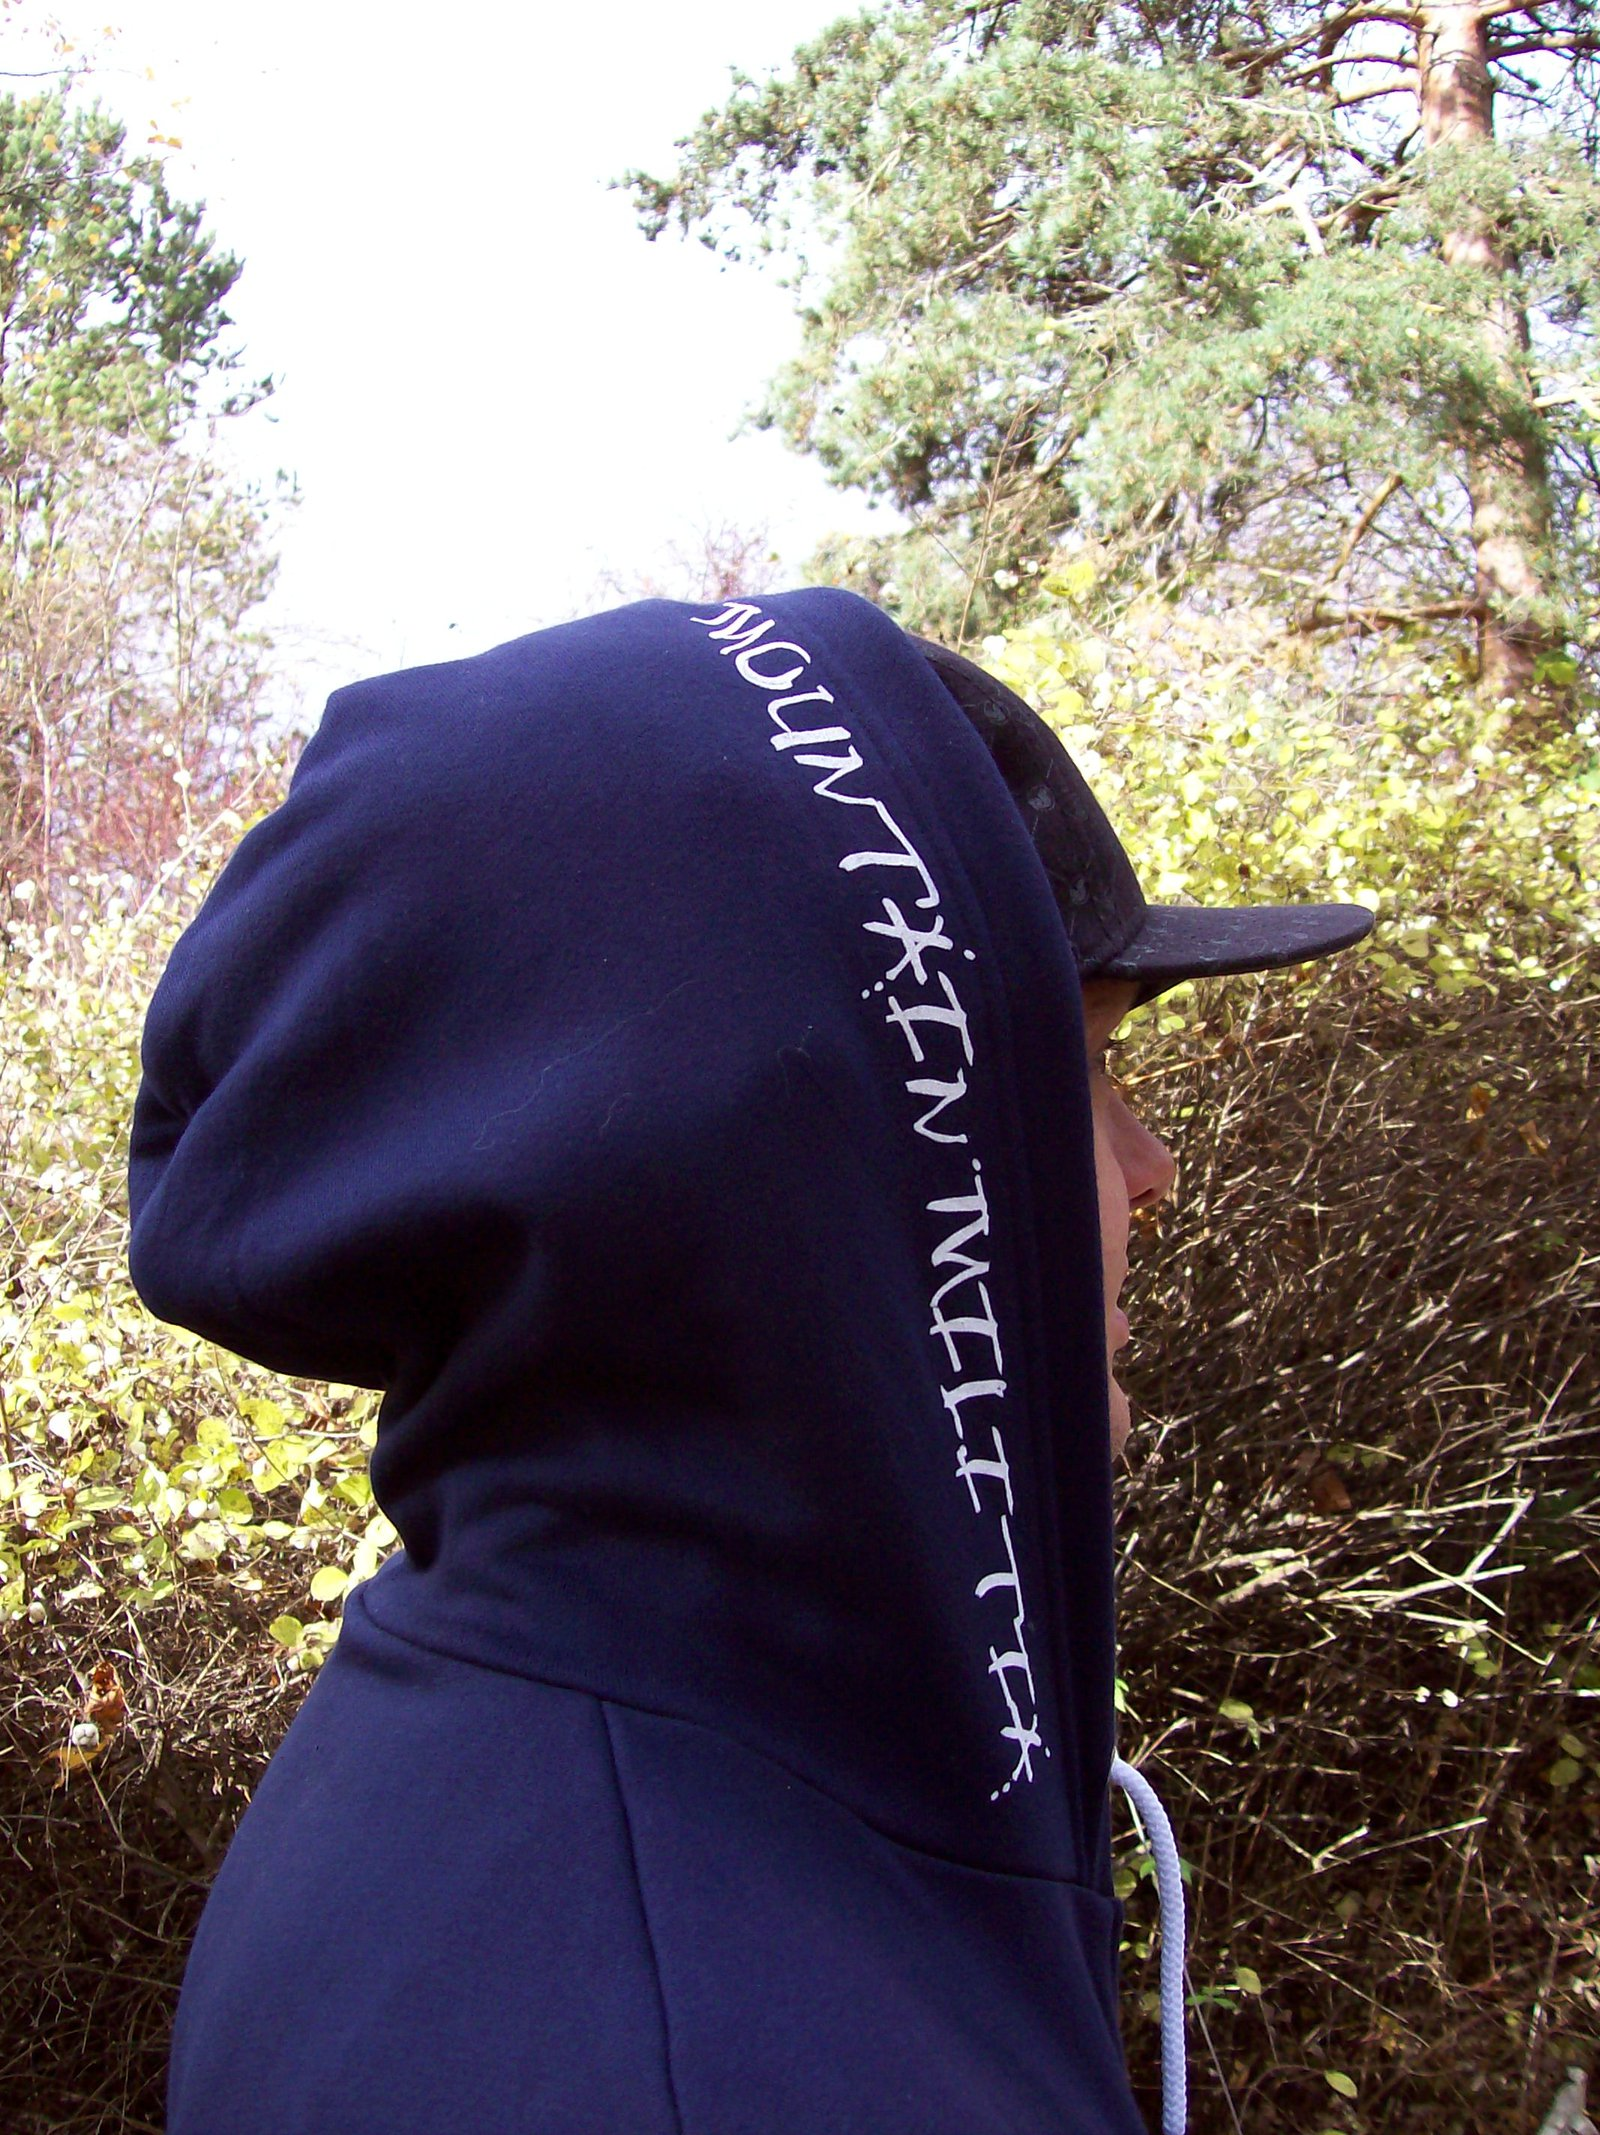 Mtn Milita Clothing - 5 of 16